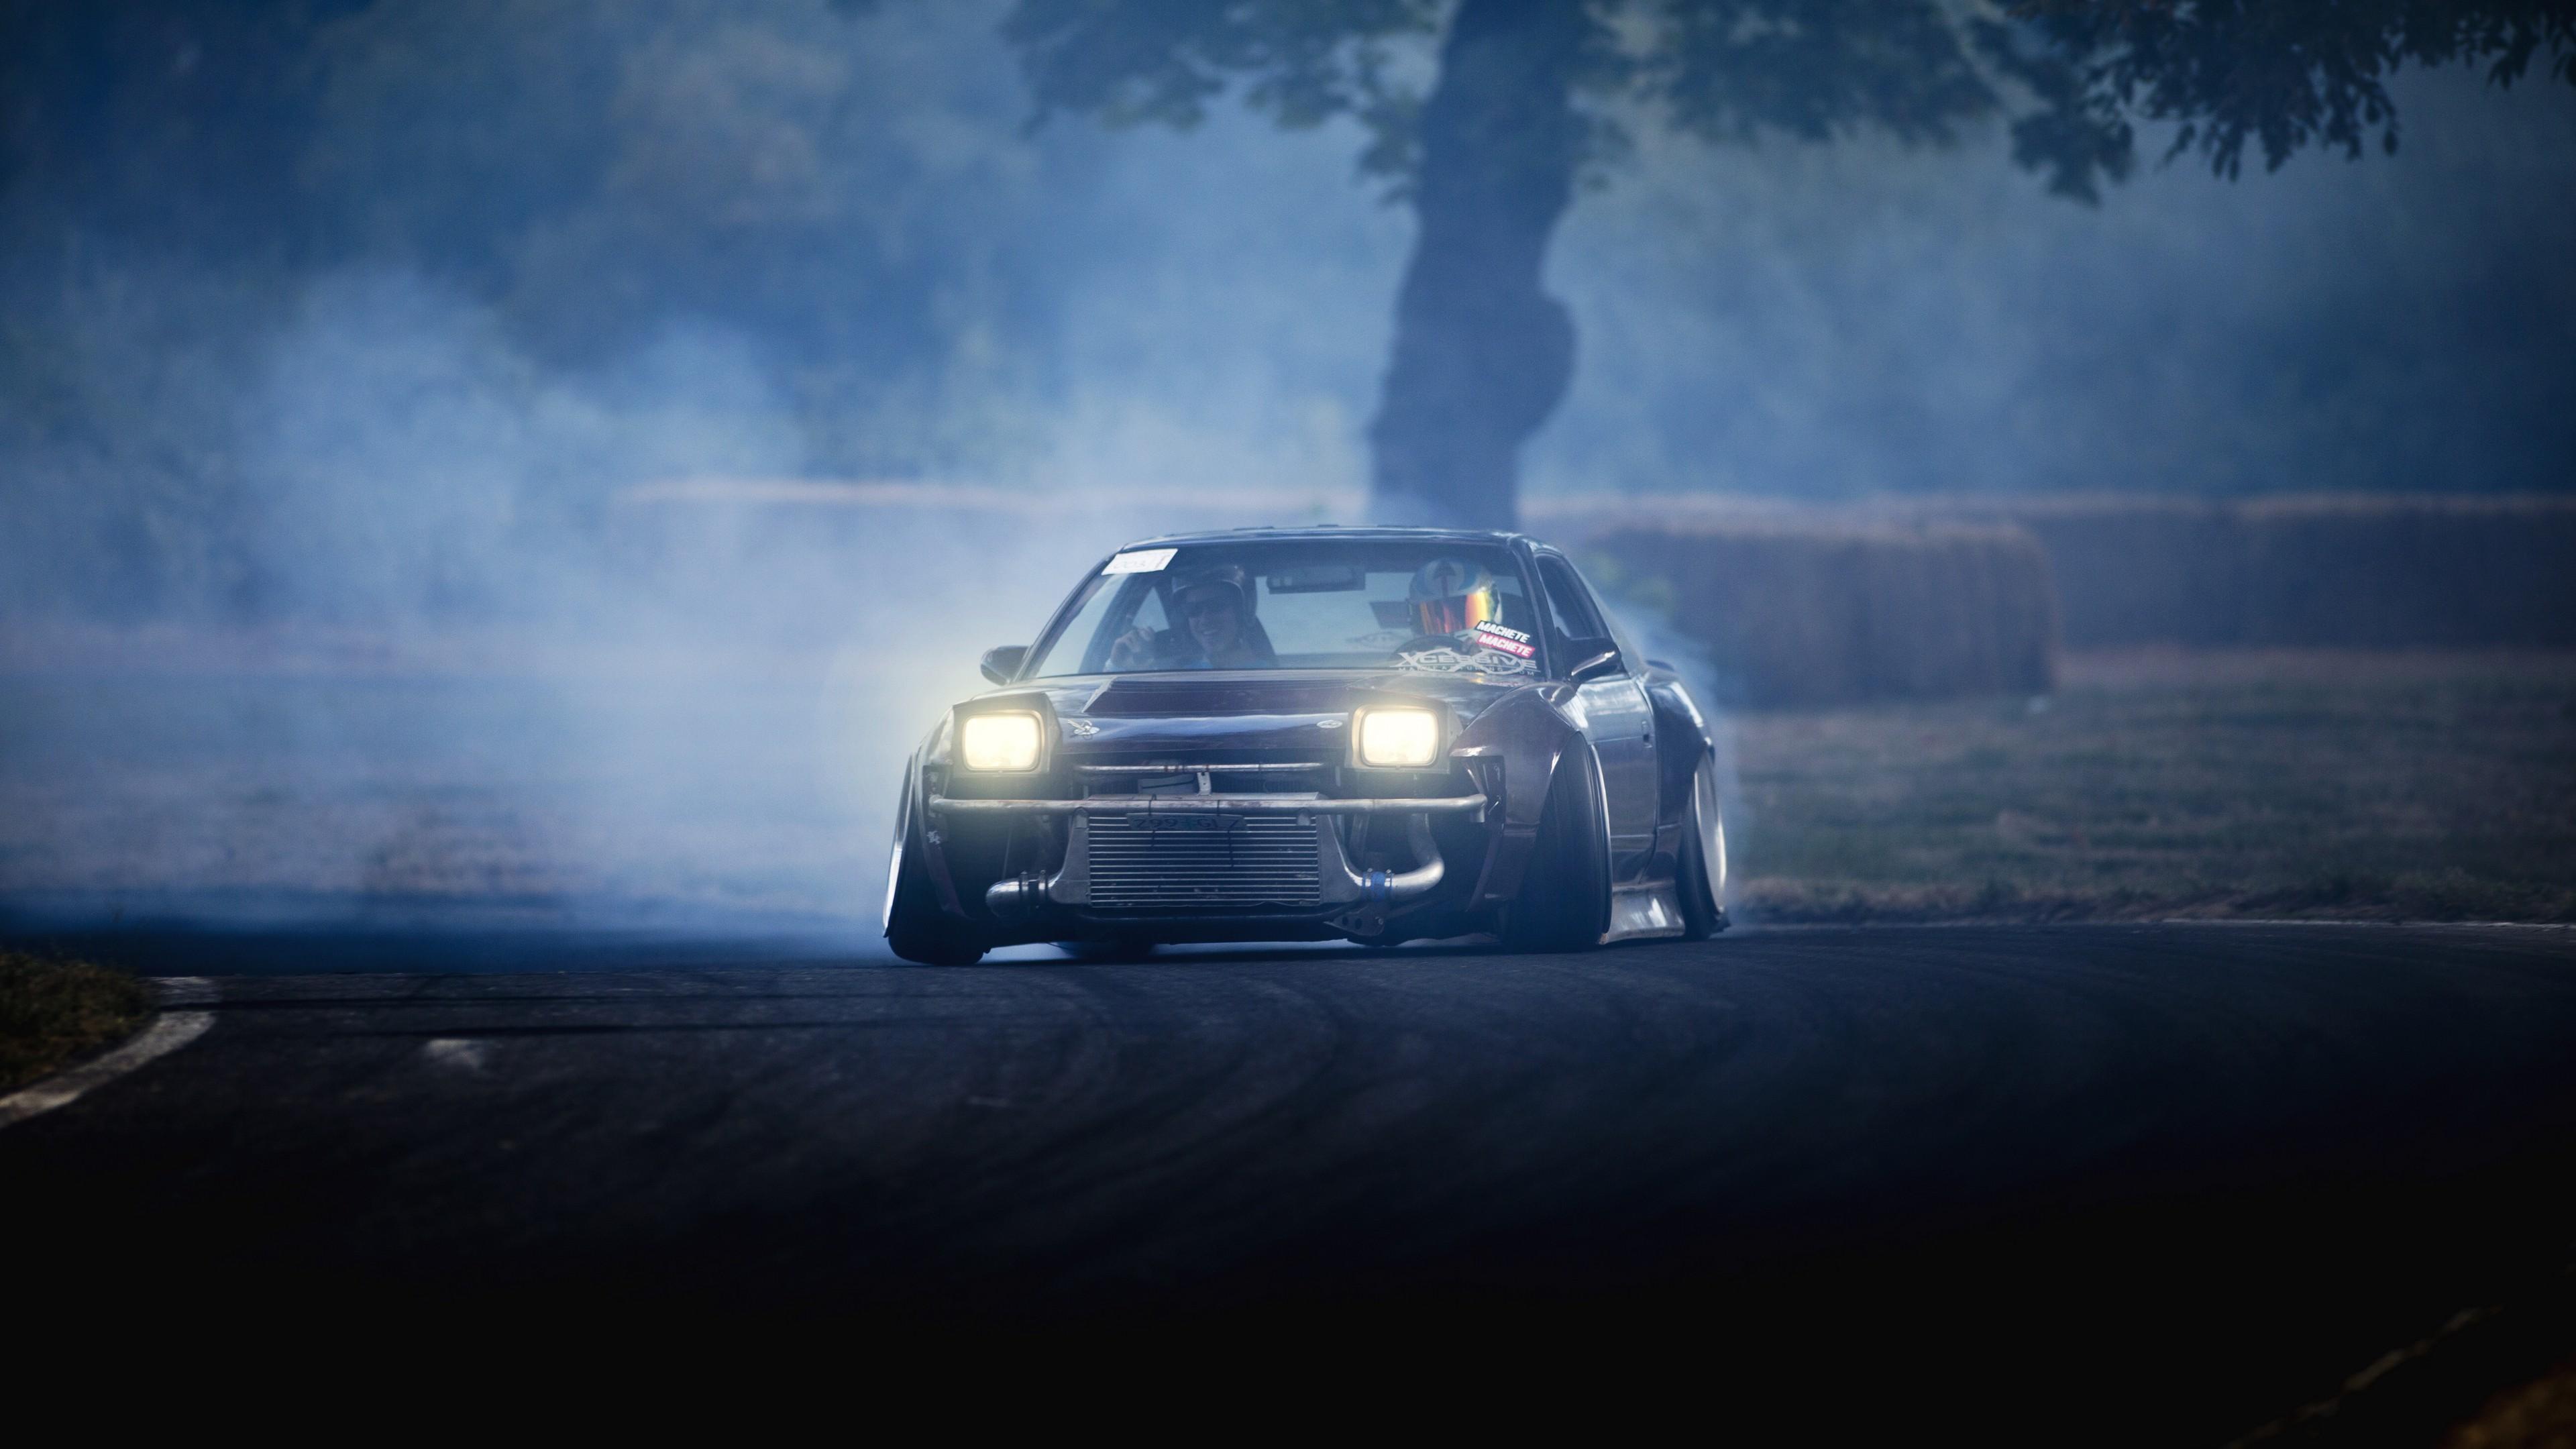 drifting car 4k 1547936909 - Drifting Car 4k - smoke wallpapers, hd-wallpapers, drifting cars wallpapers, drift wallpapers, 4k-wallpapers